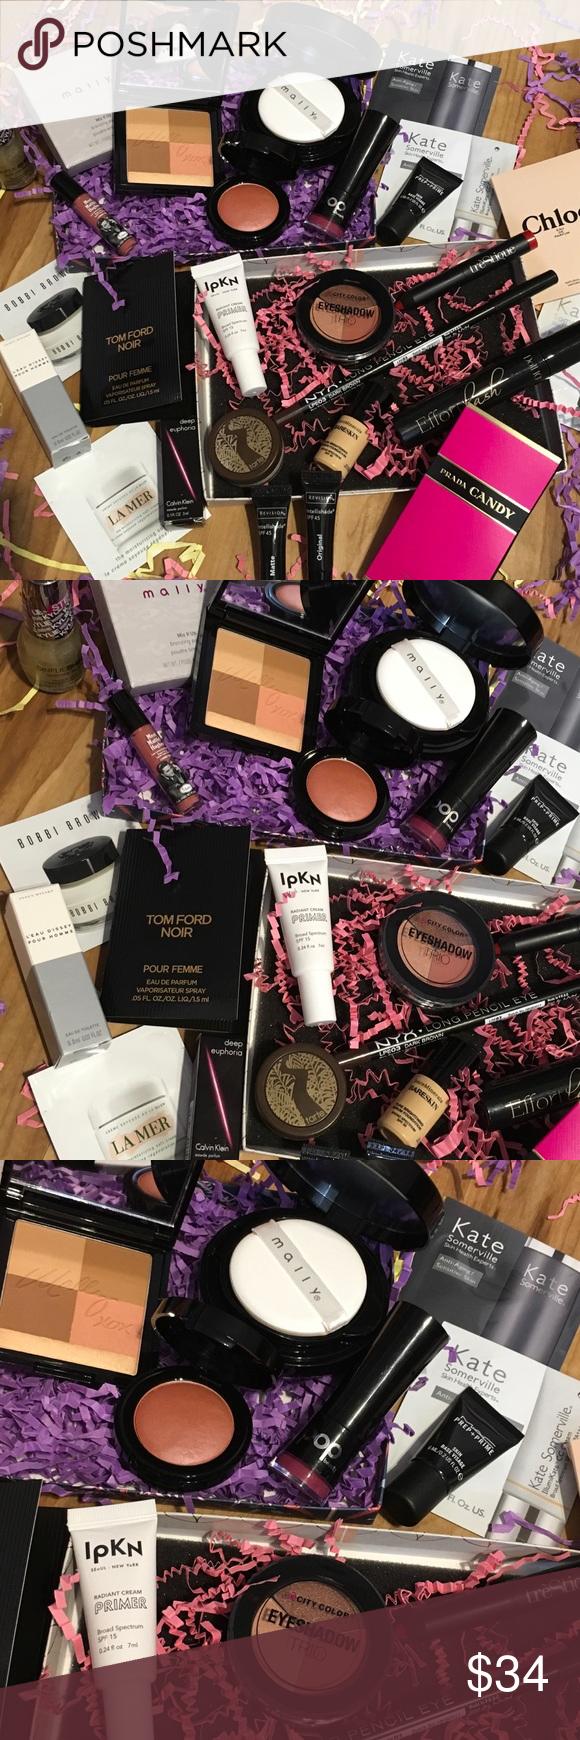 Girl, you're makeup is on FLEEK!! Perfume samples